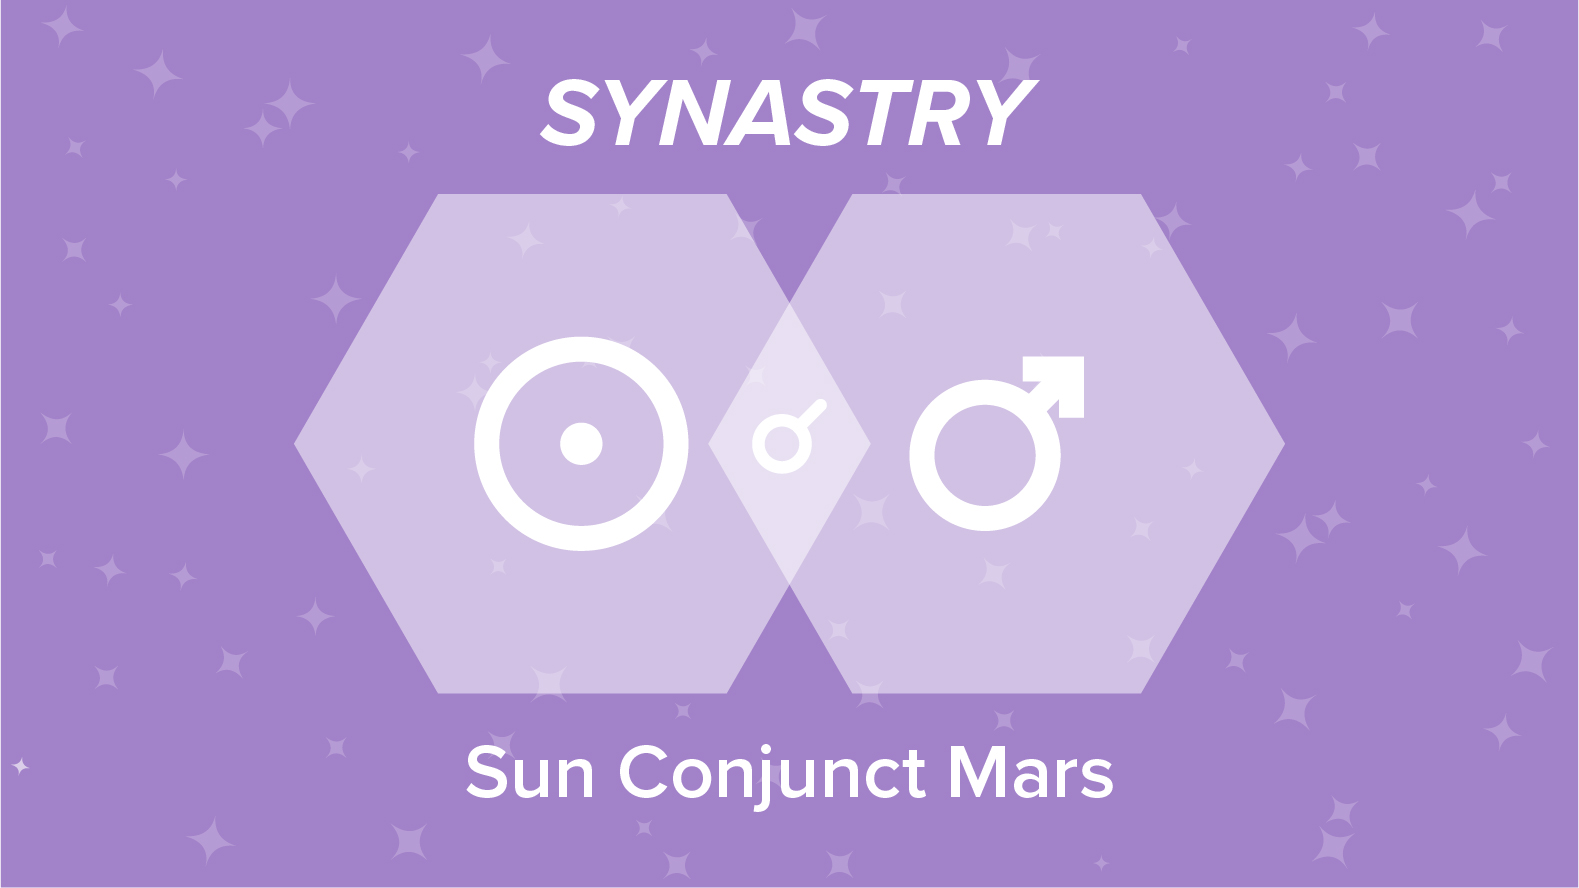 Sun Conjunct Mars Synastry